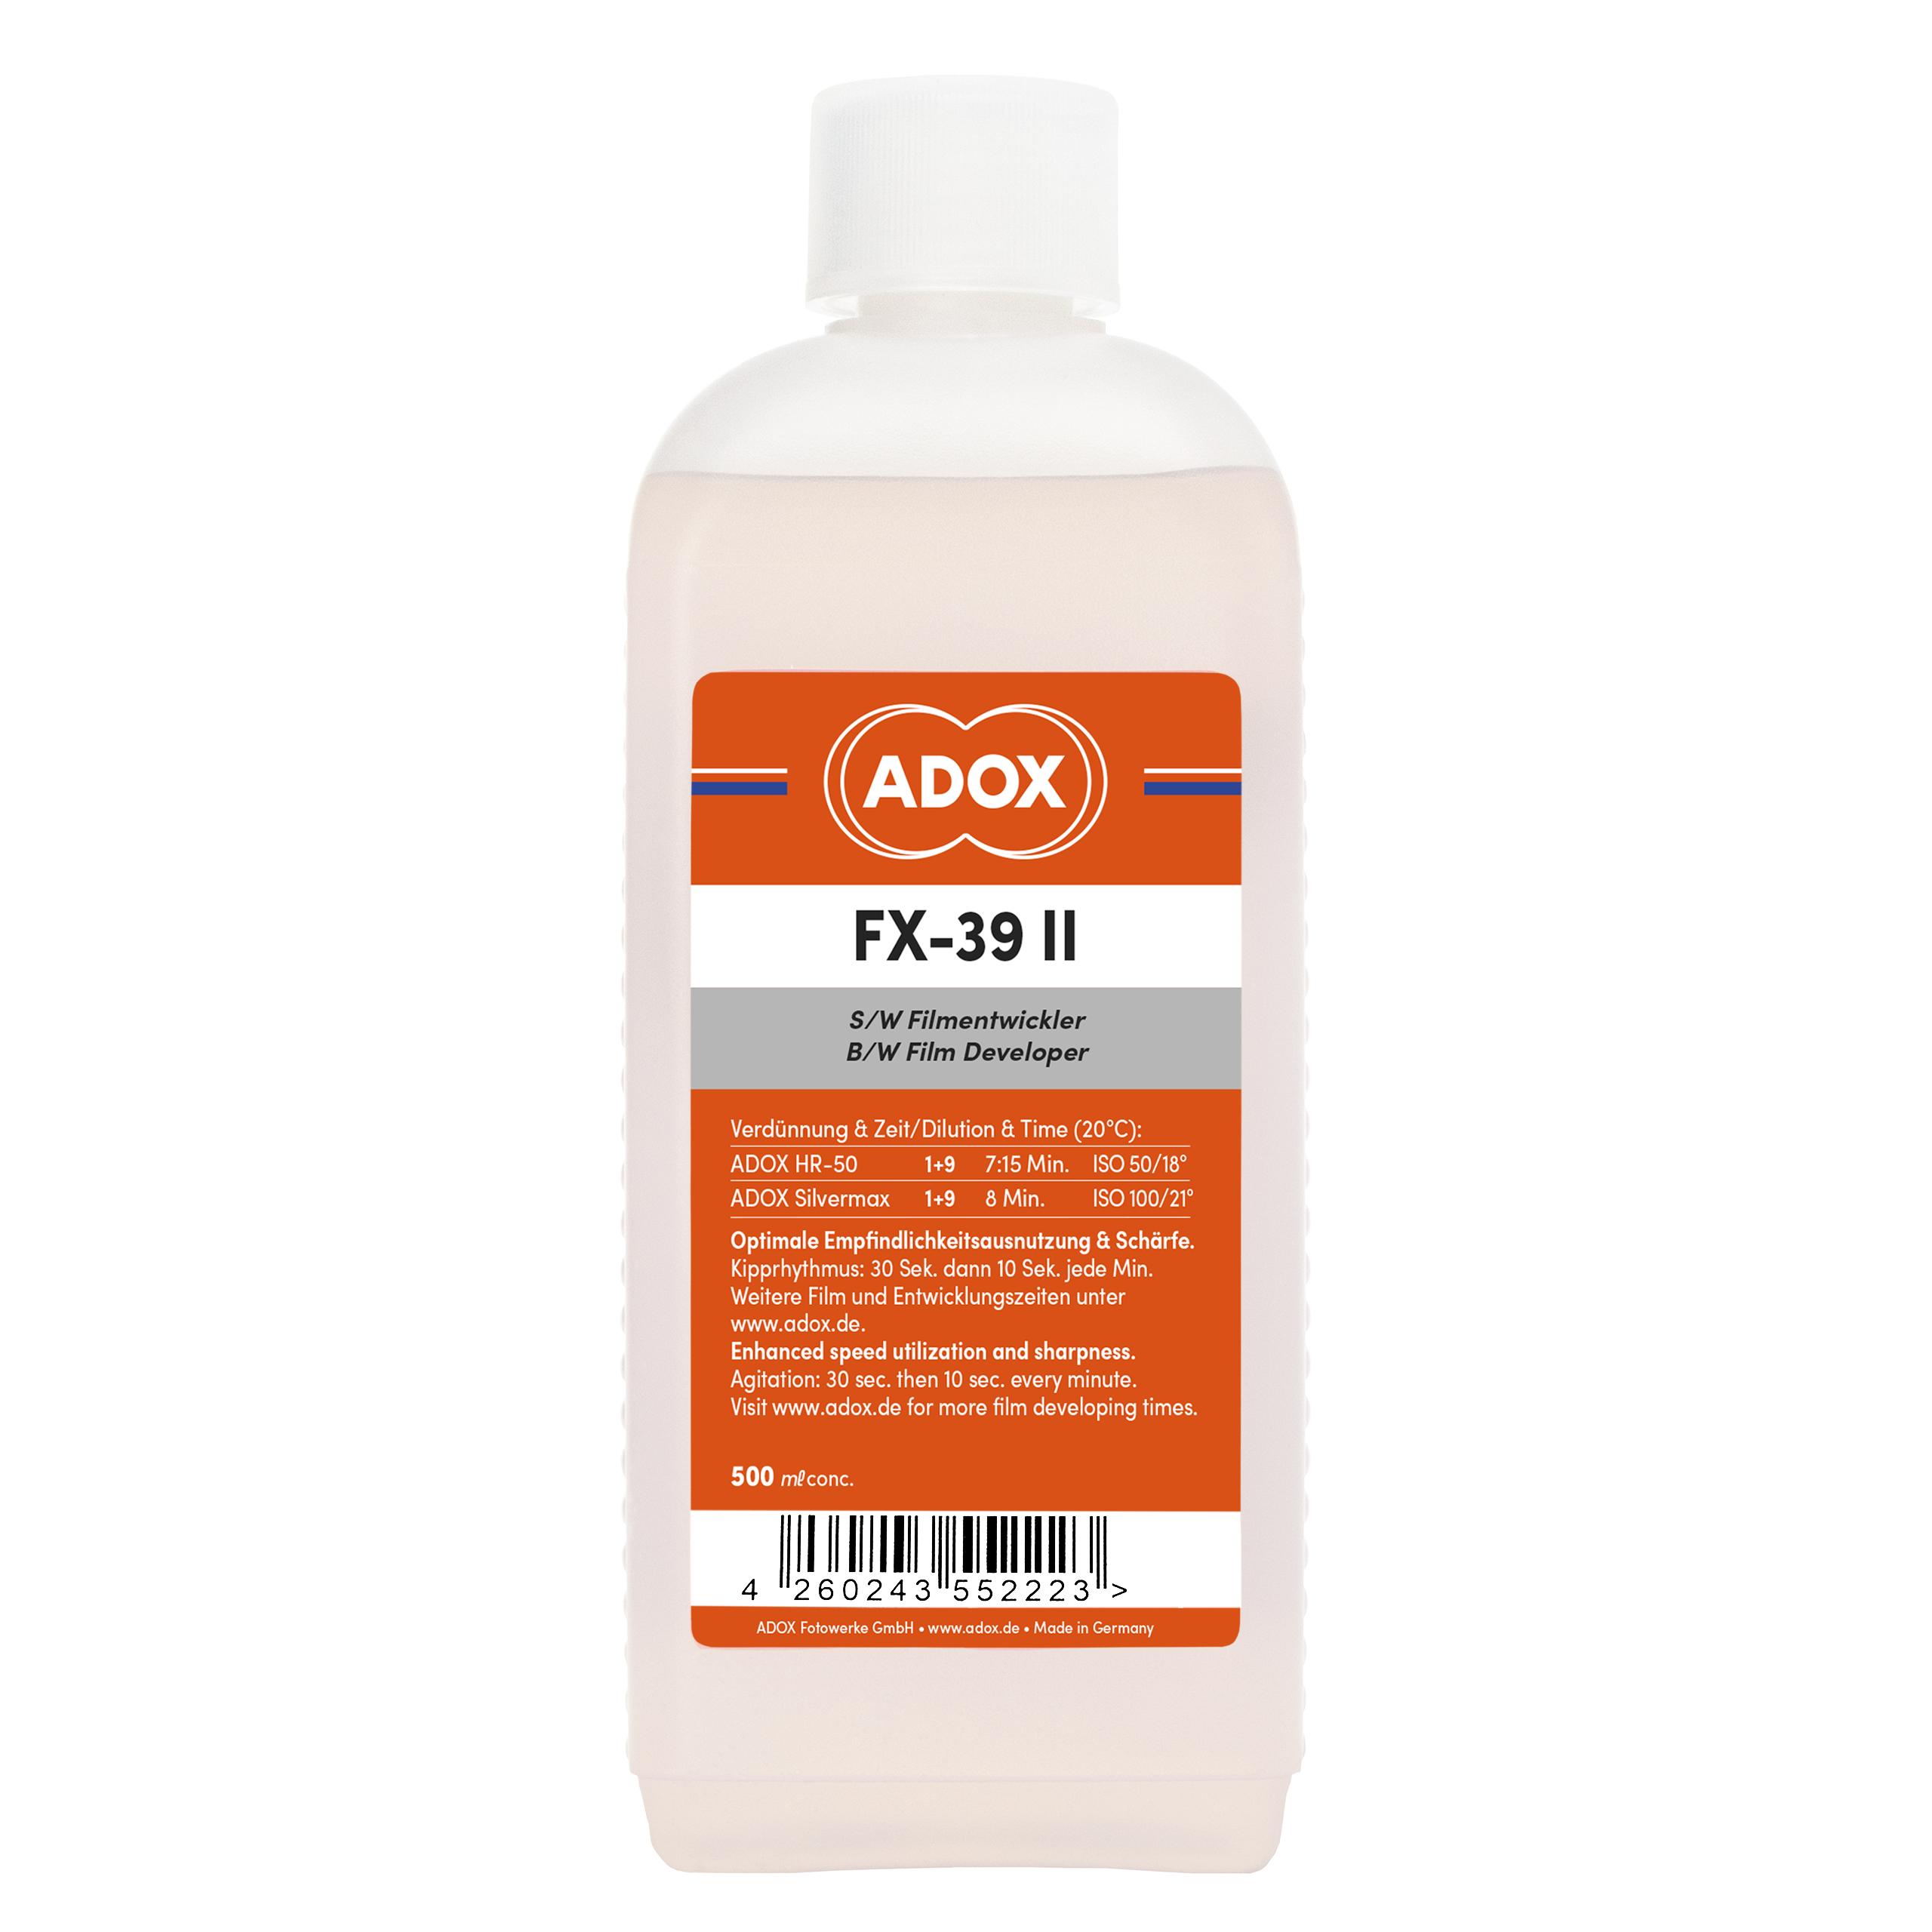 ADOX FX-39 II